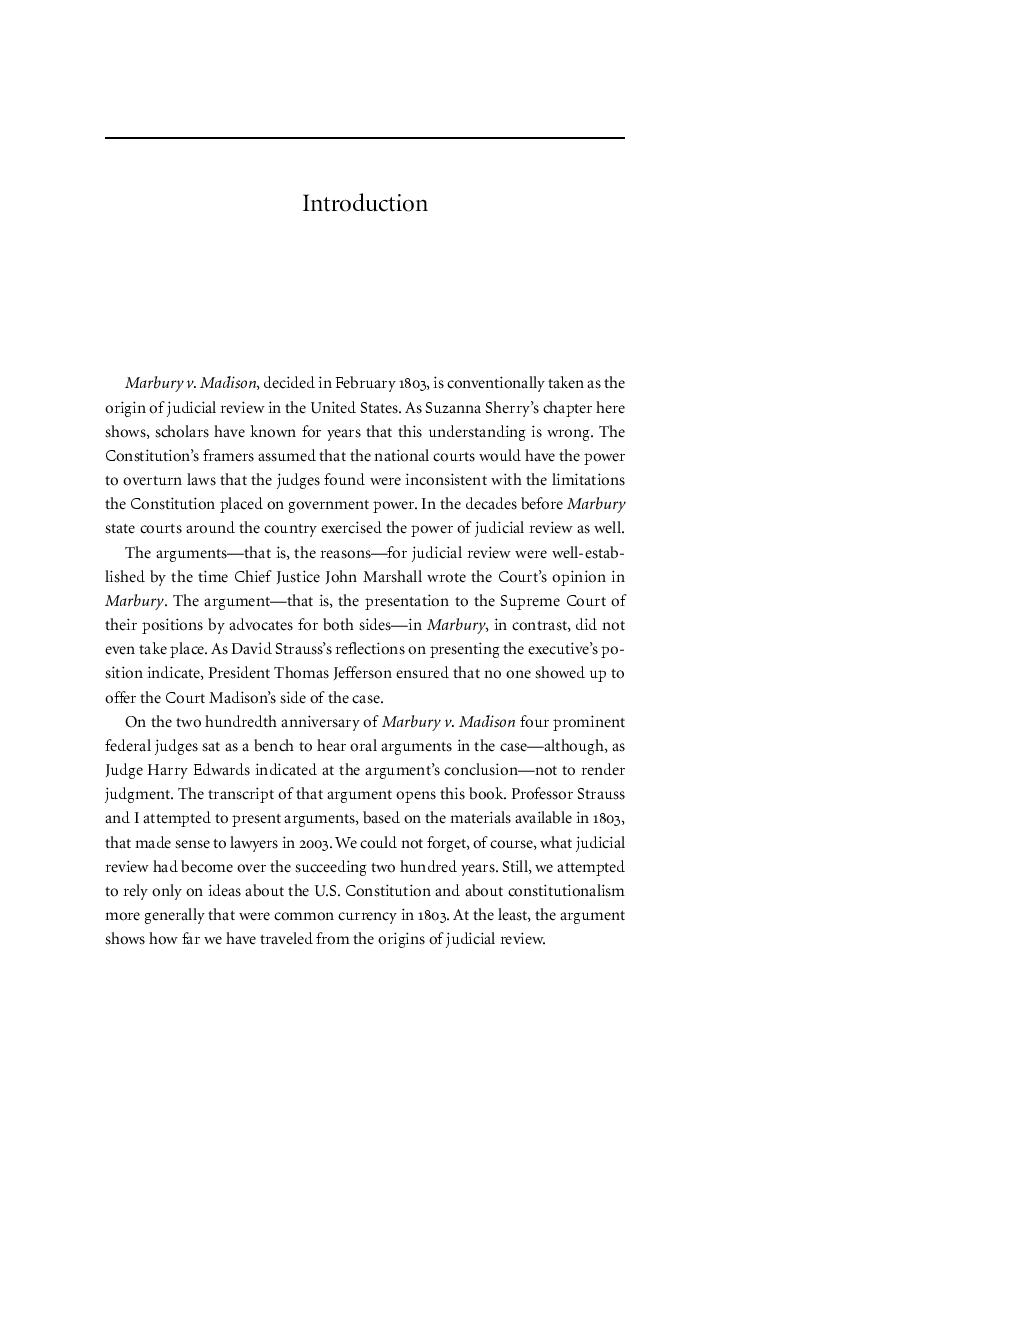 uw madison admission essay